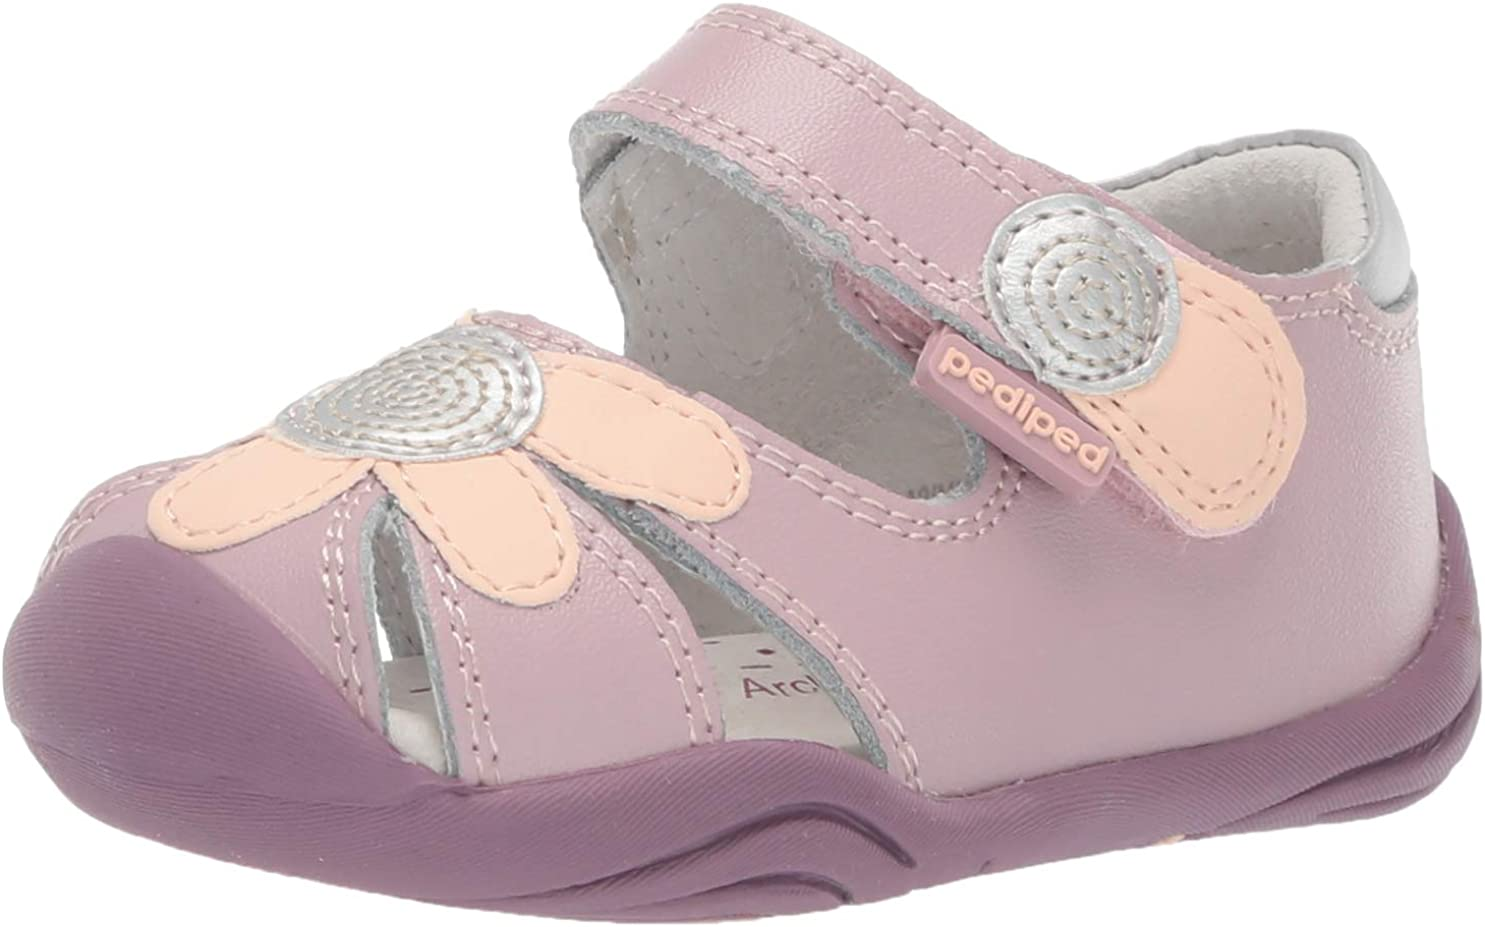 pediped Unisex-Child Daisy First Walker Shoe